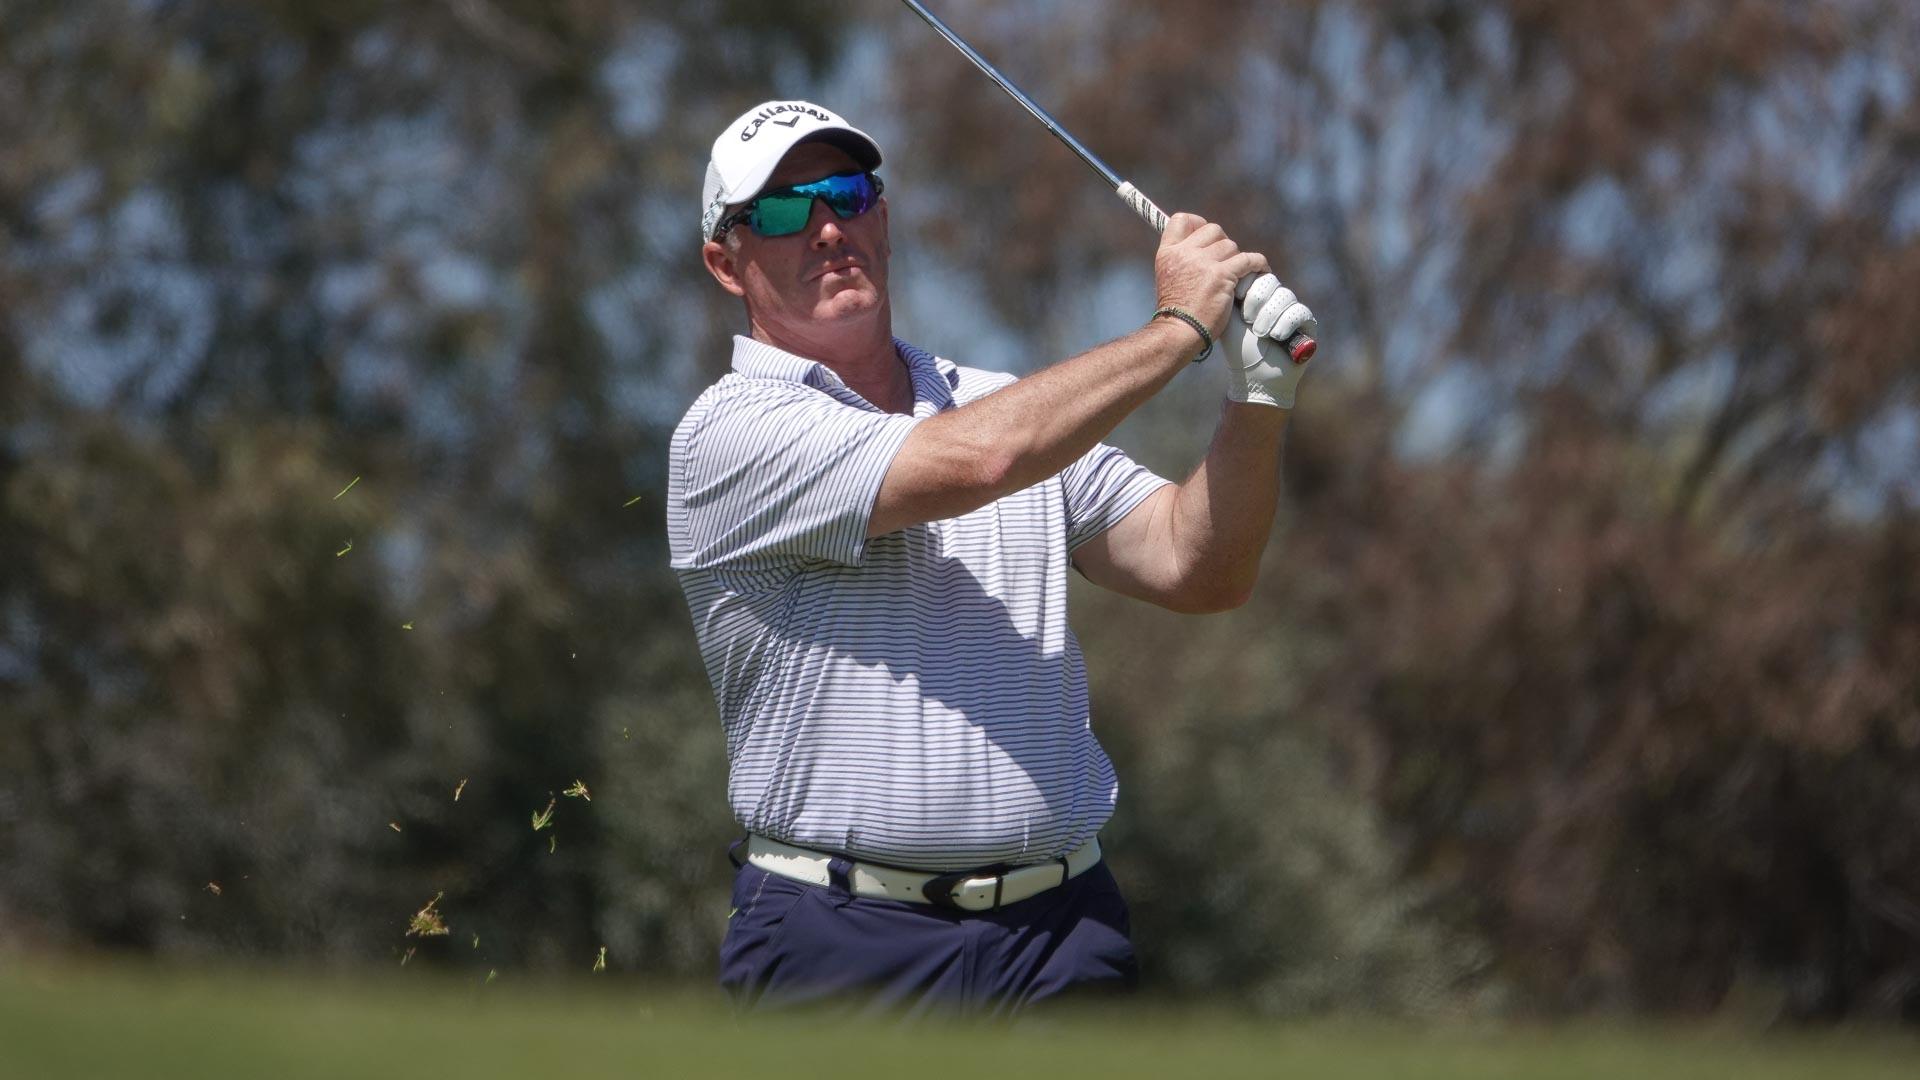 Pete Lonard